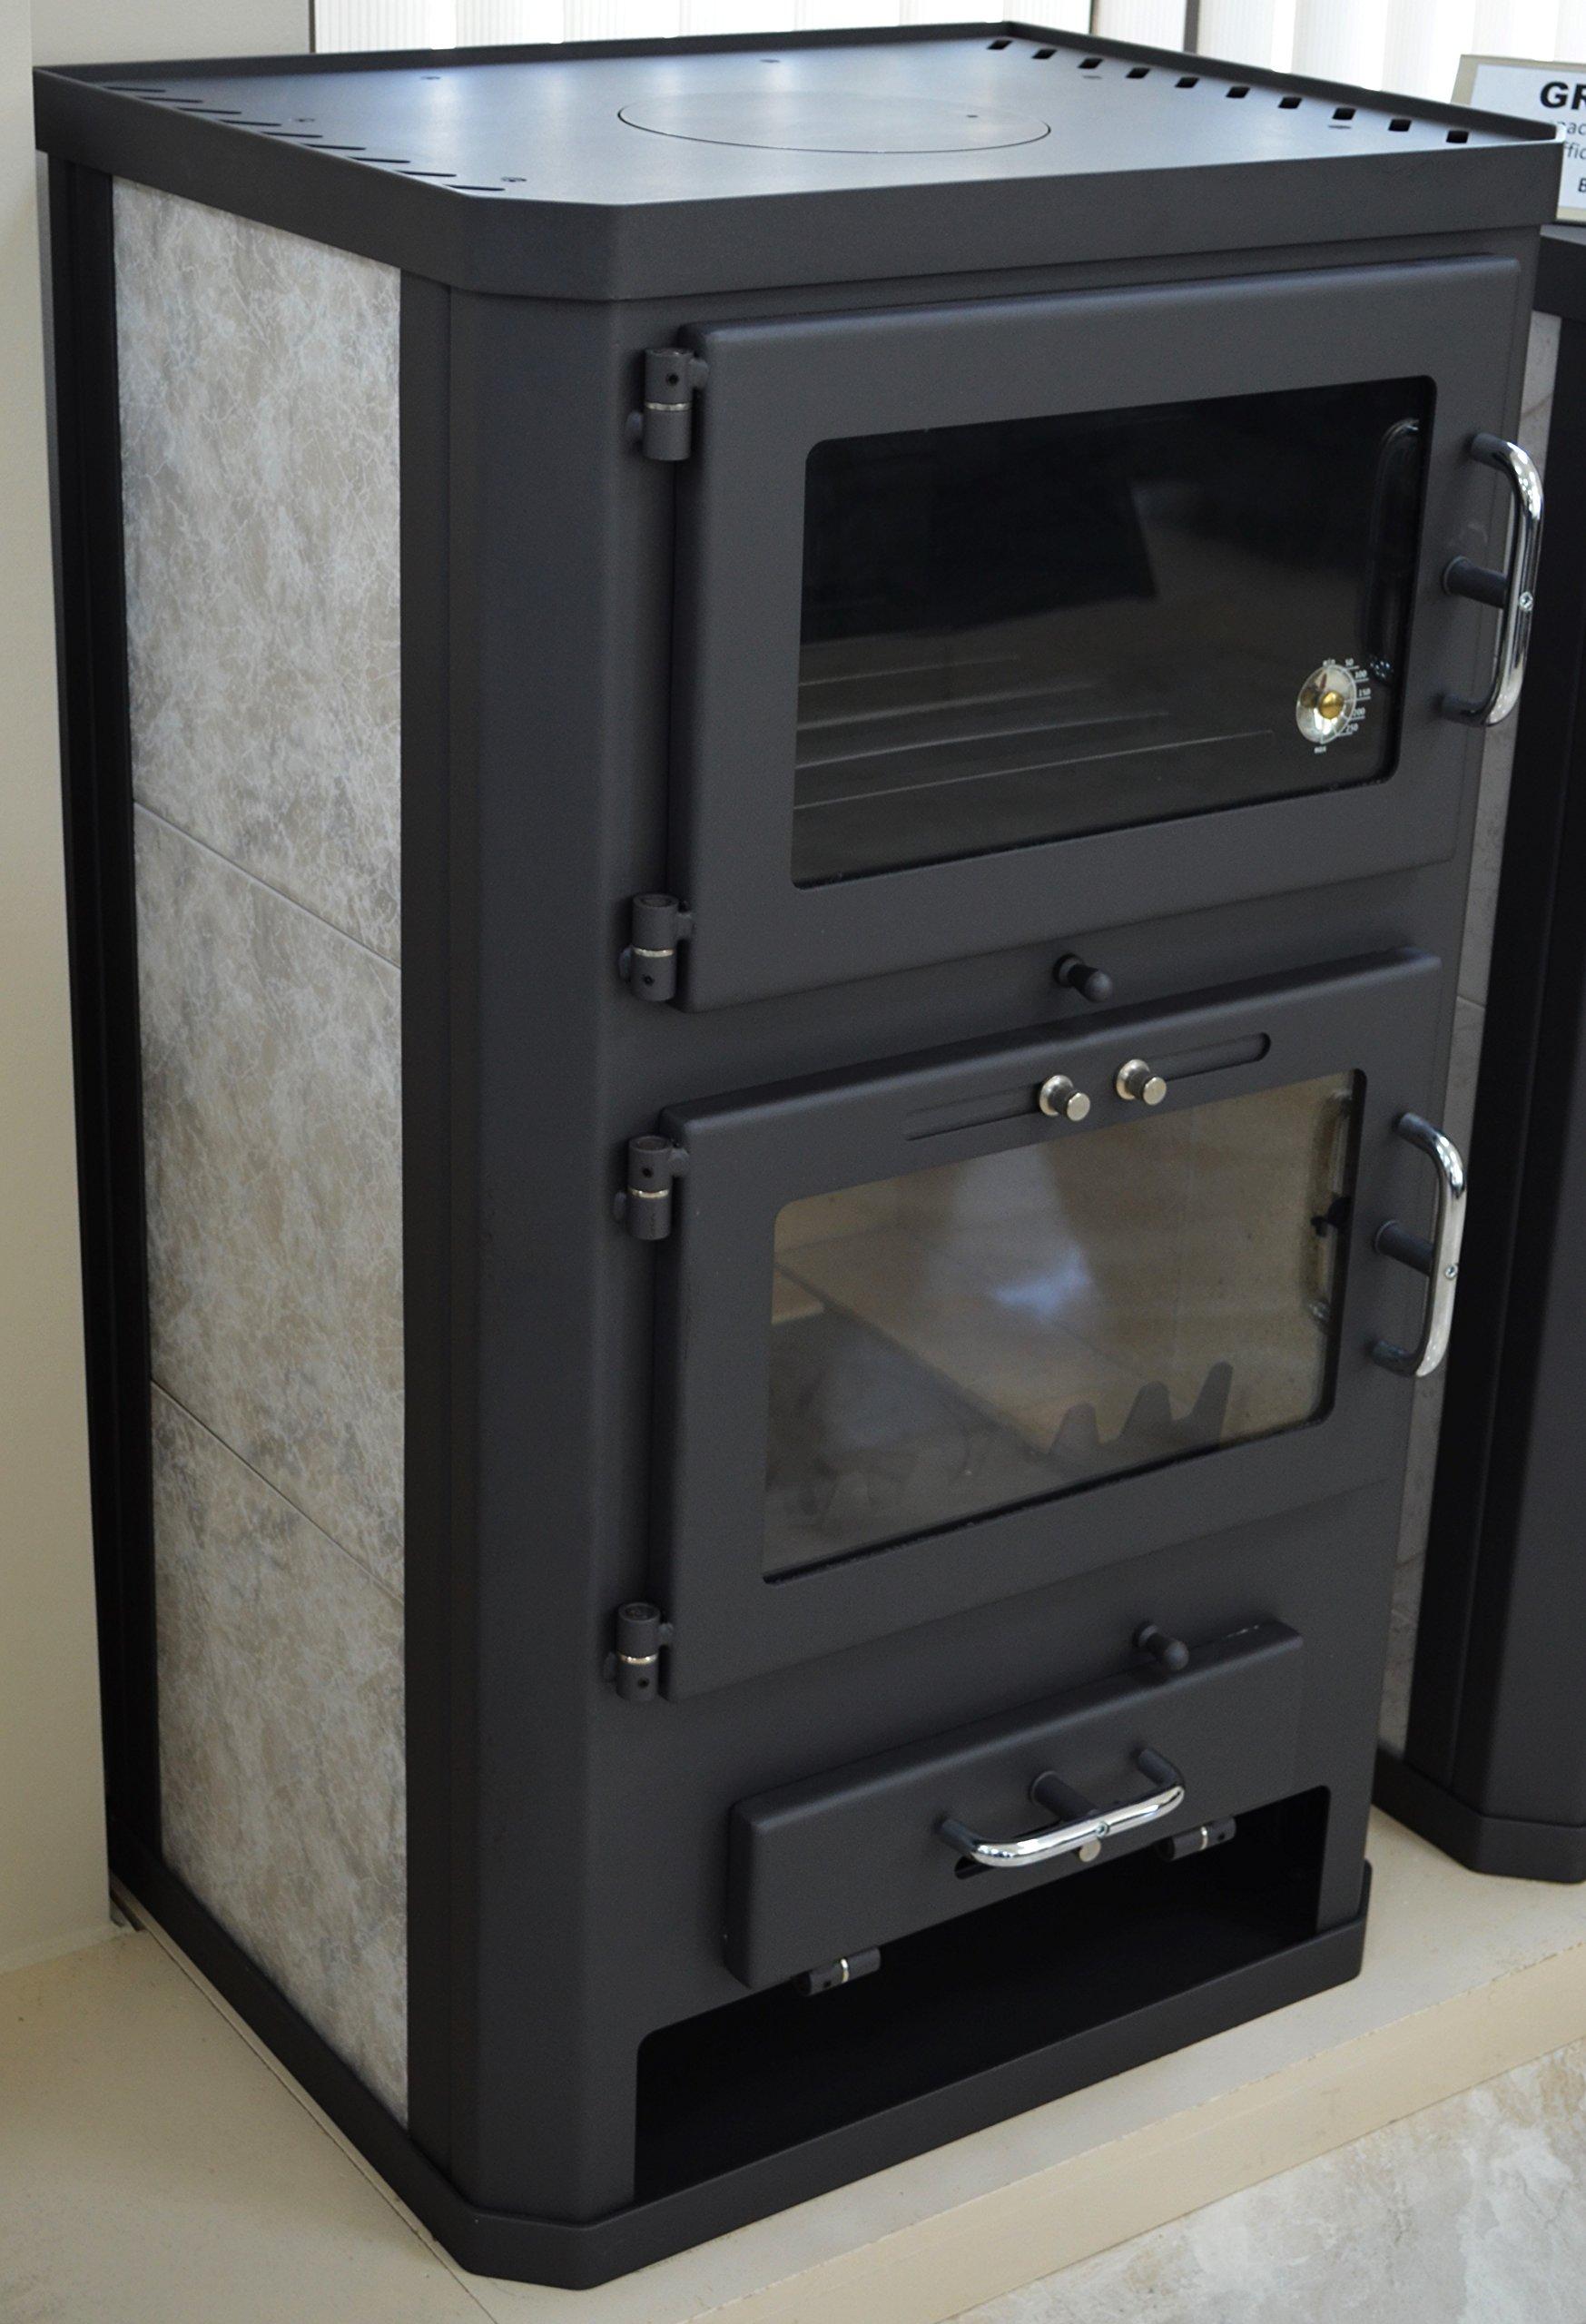 Estufa de leña para estufa, estufa, cocina, combustible, quemador de leña, 12/17 kW, BImSchV 2